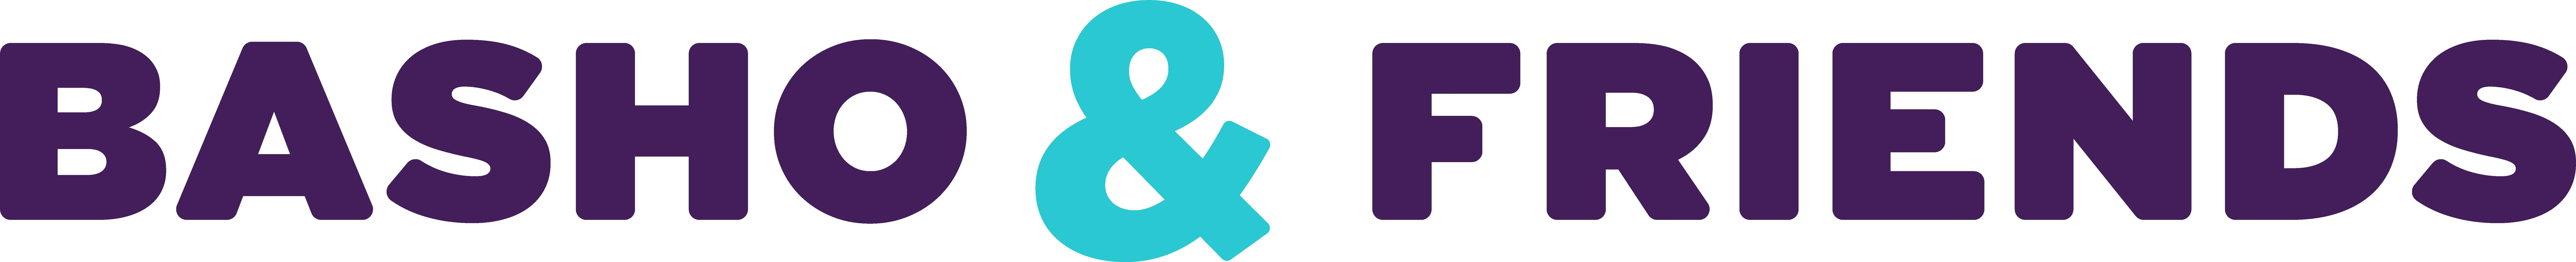 BASHO & FRIENDS logo